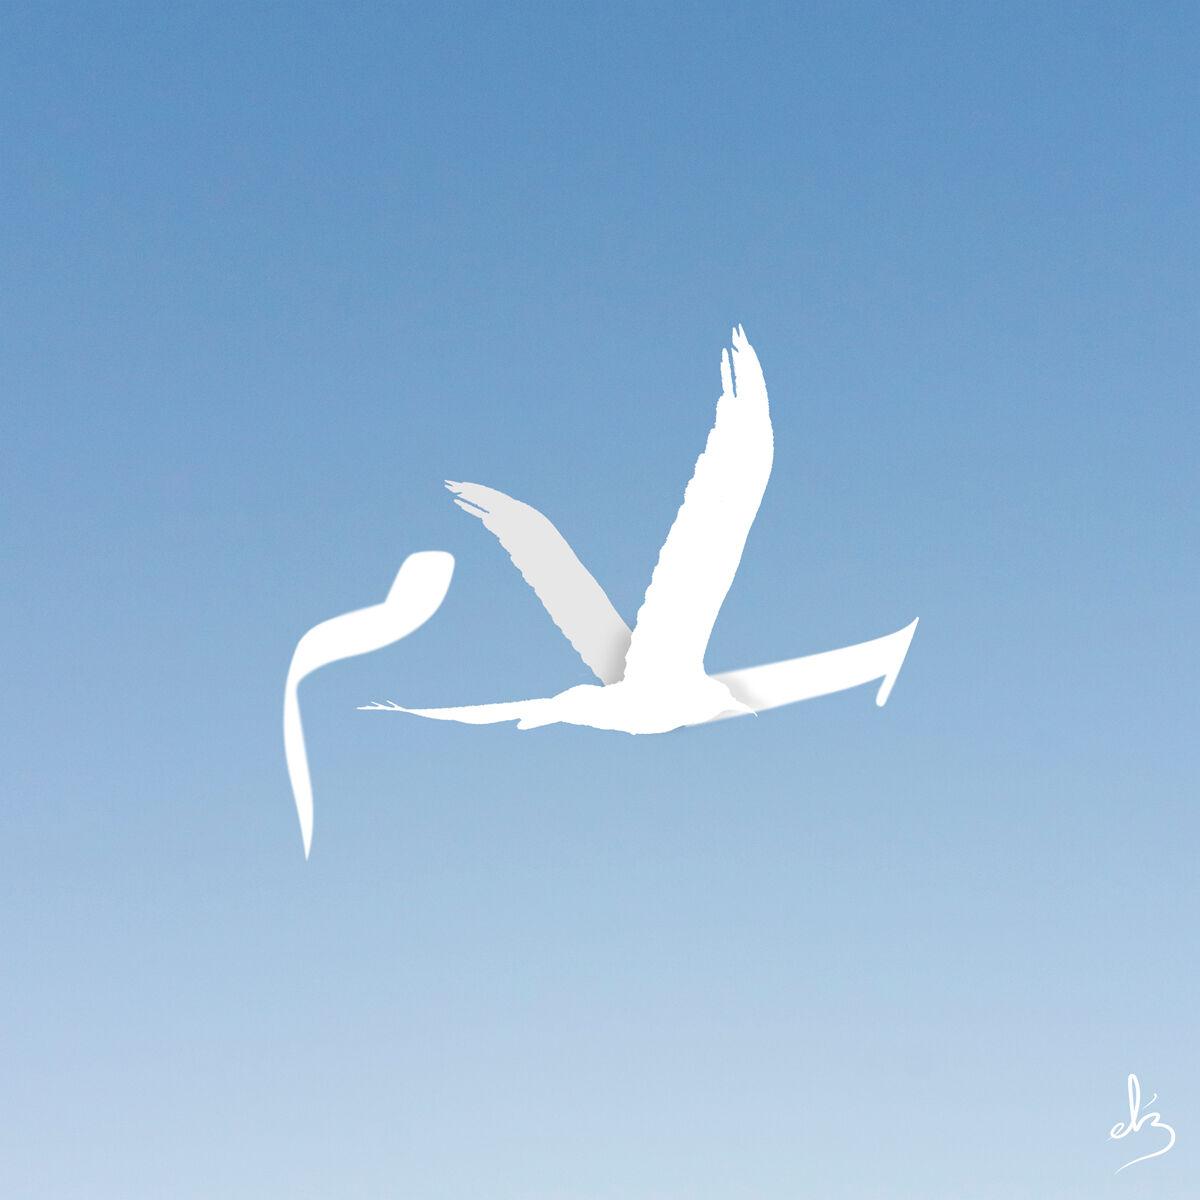 Graphic cover artwork